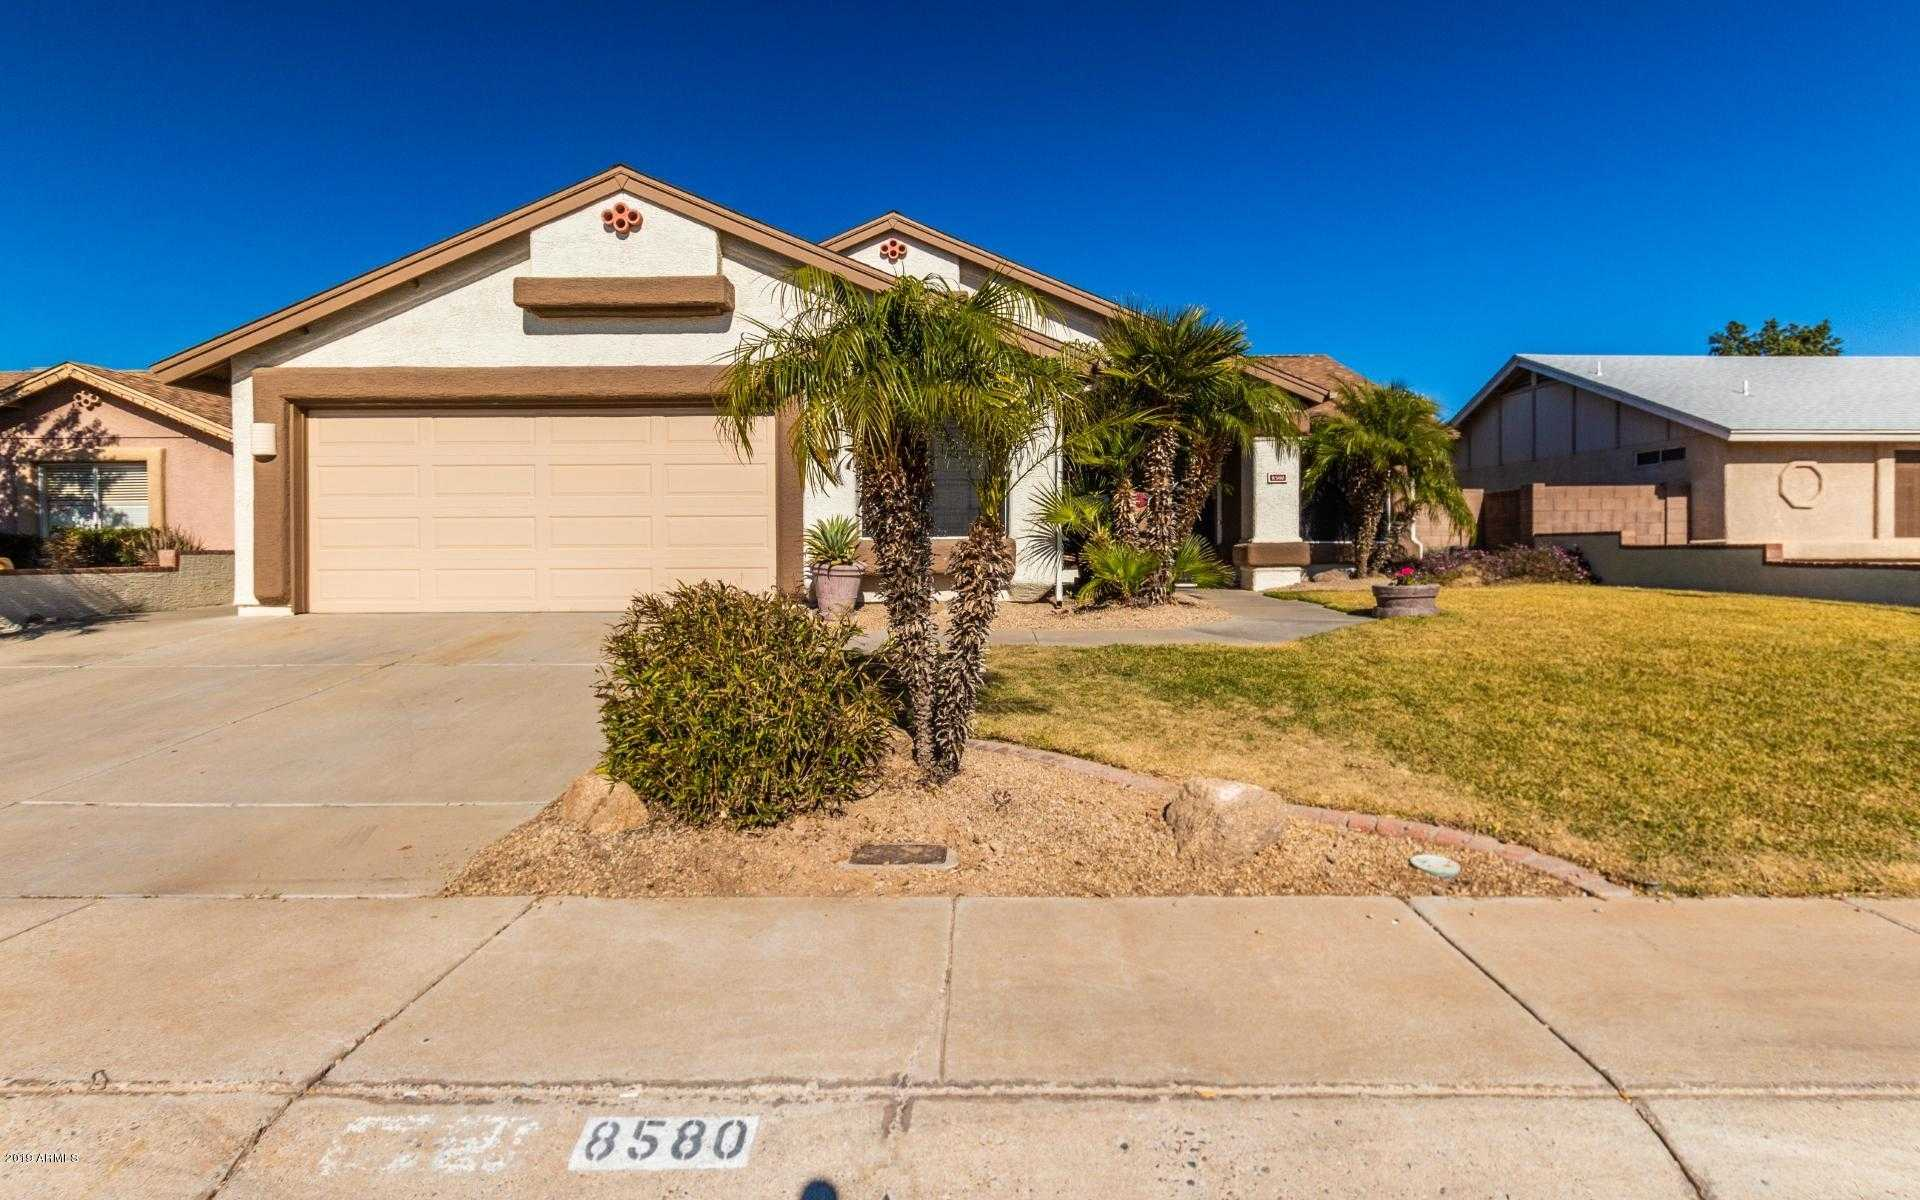 $235,000 - 3Br/2Ba - Home for Sale in Camelback Park Lot 1-288 Tr A-d, Glendale